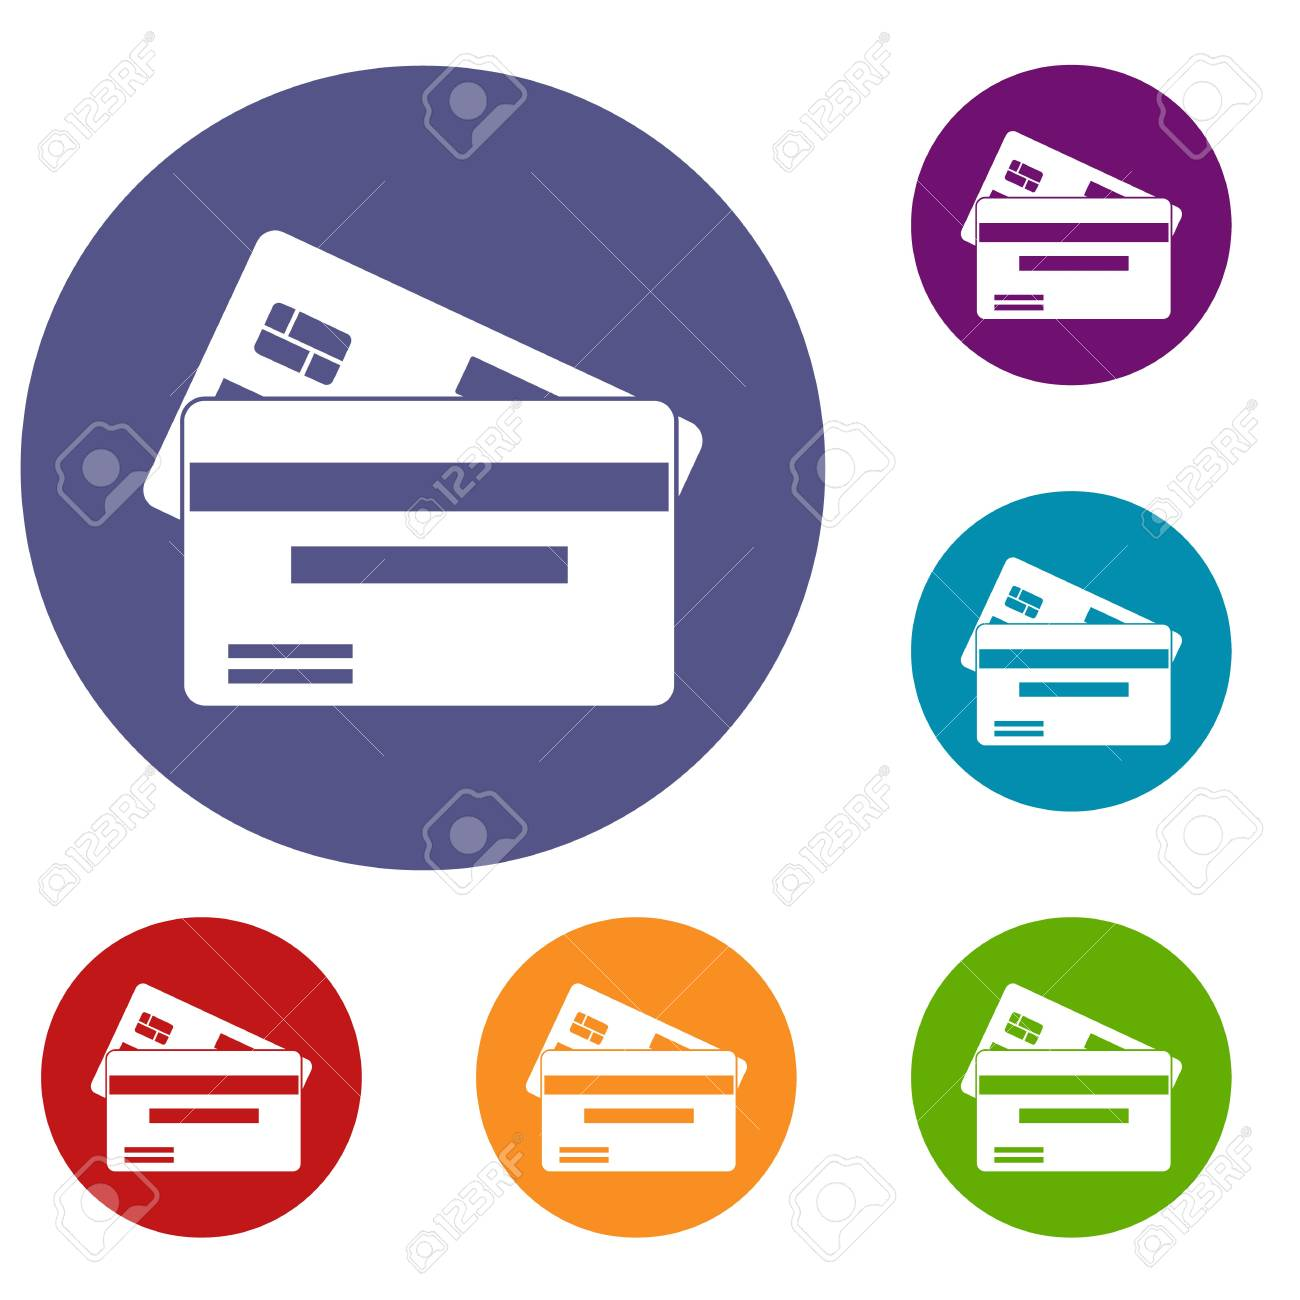 credit card icons set in flat circle reb blue and green color rh 123rf com credit card logos vector free download credit card icons vector free download